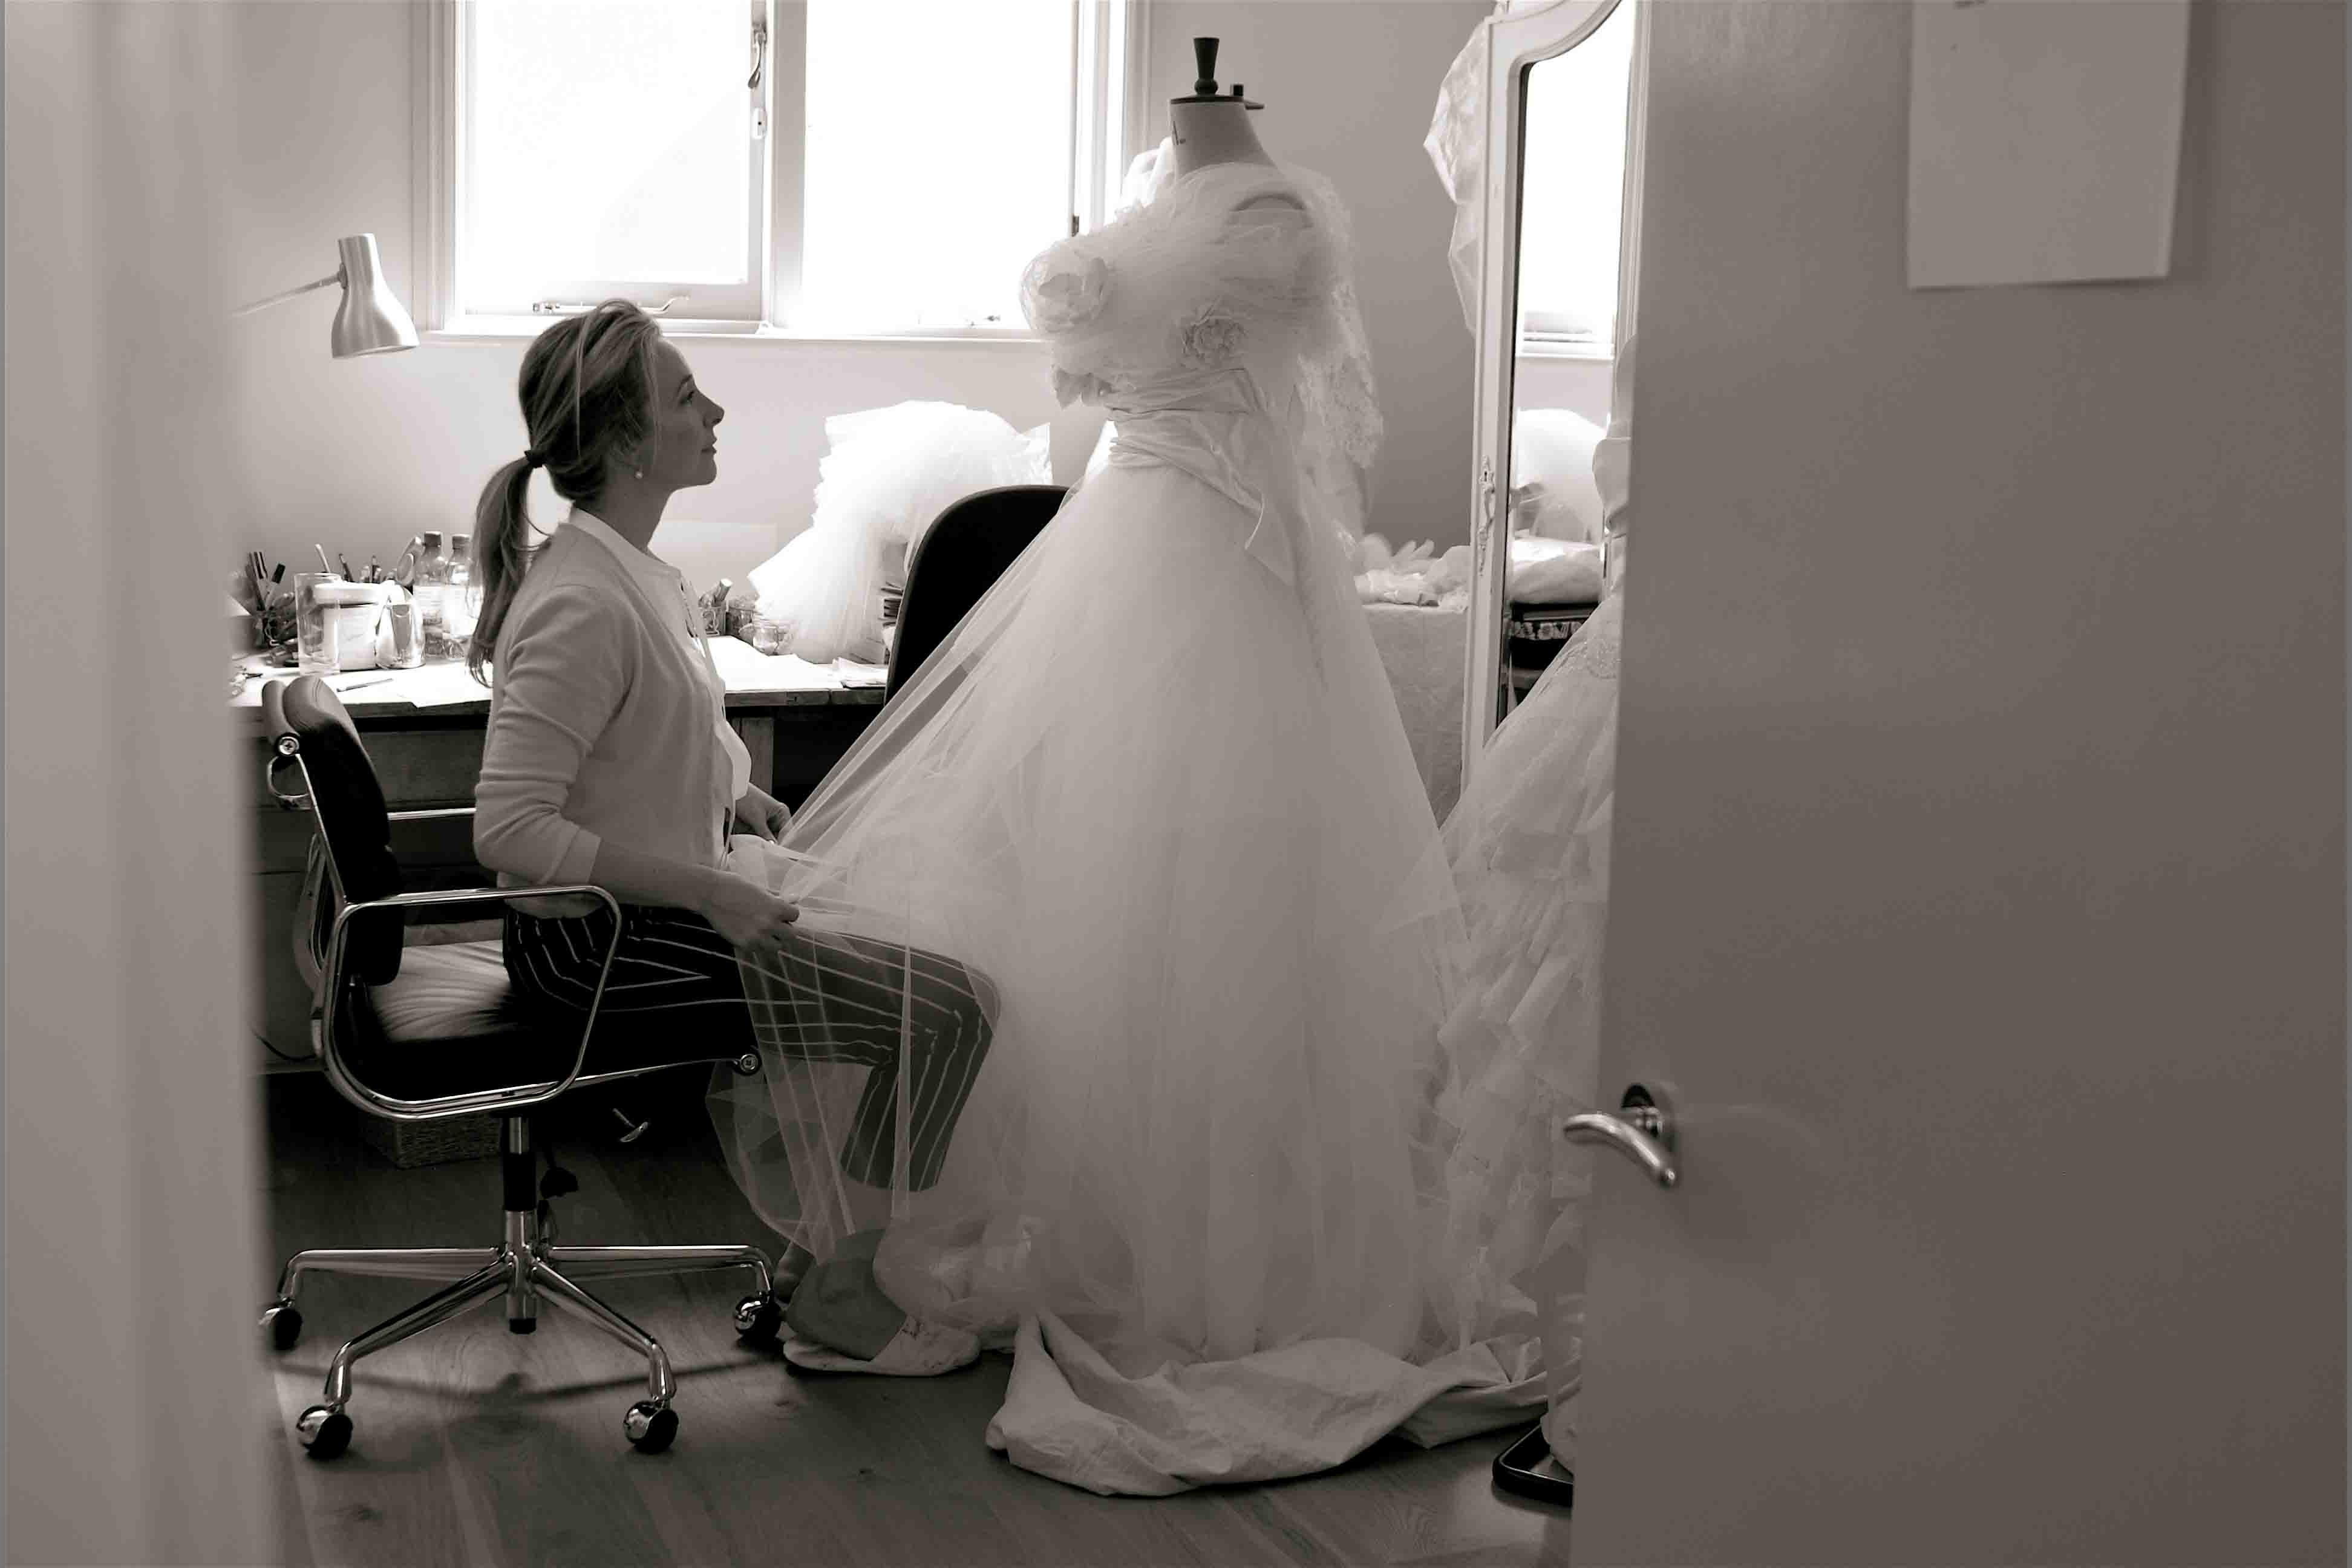 bridebook.co.uk phillipa lepley at work on a dress in her studio